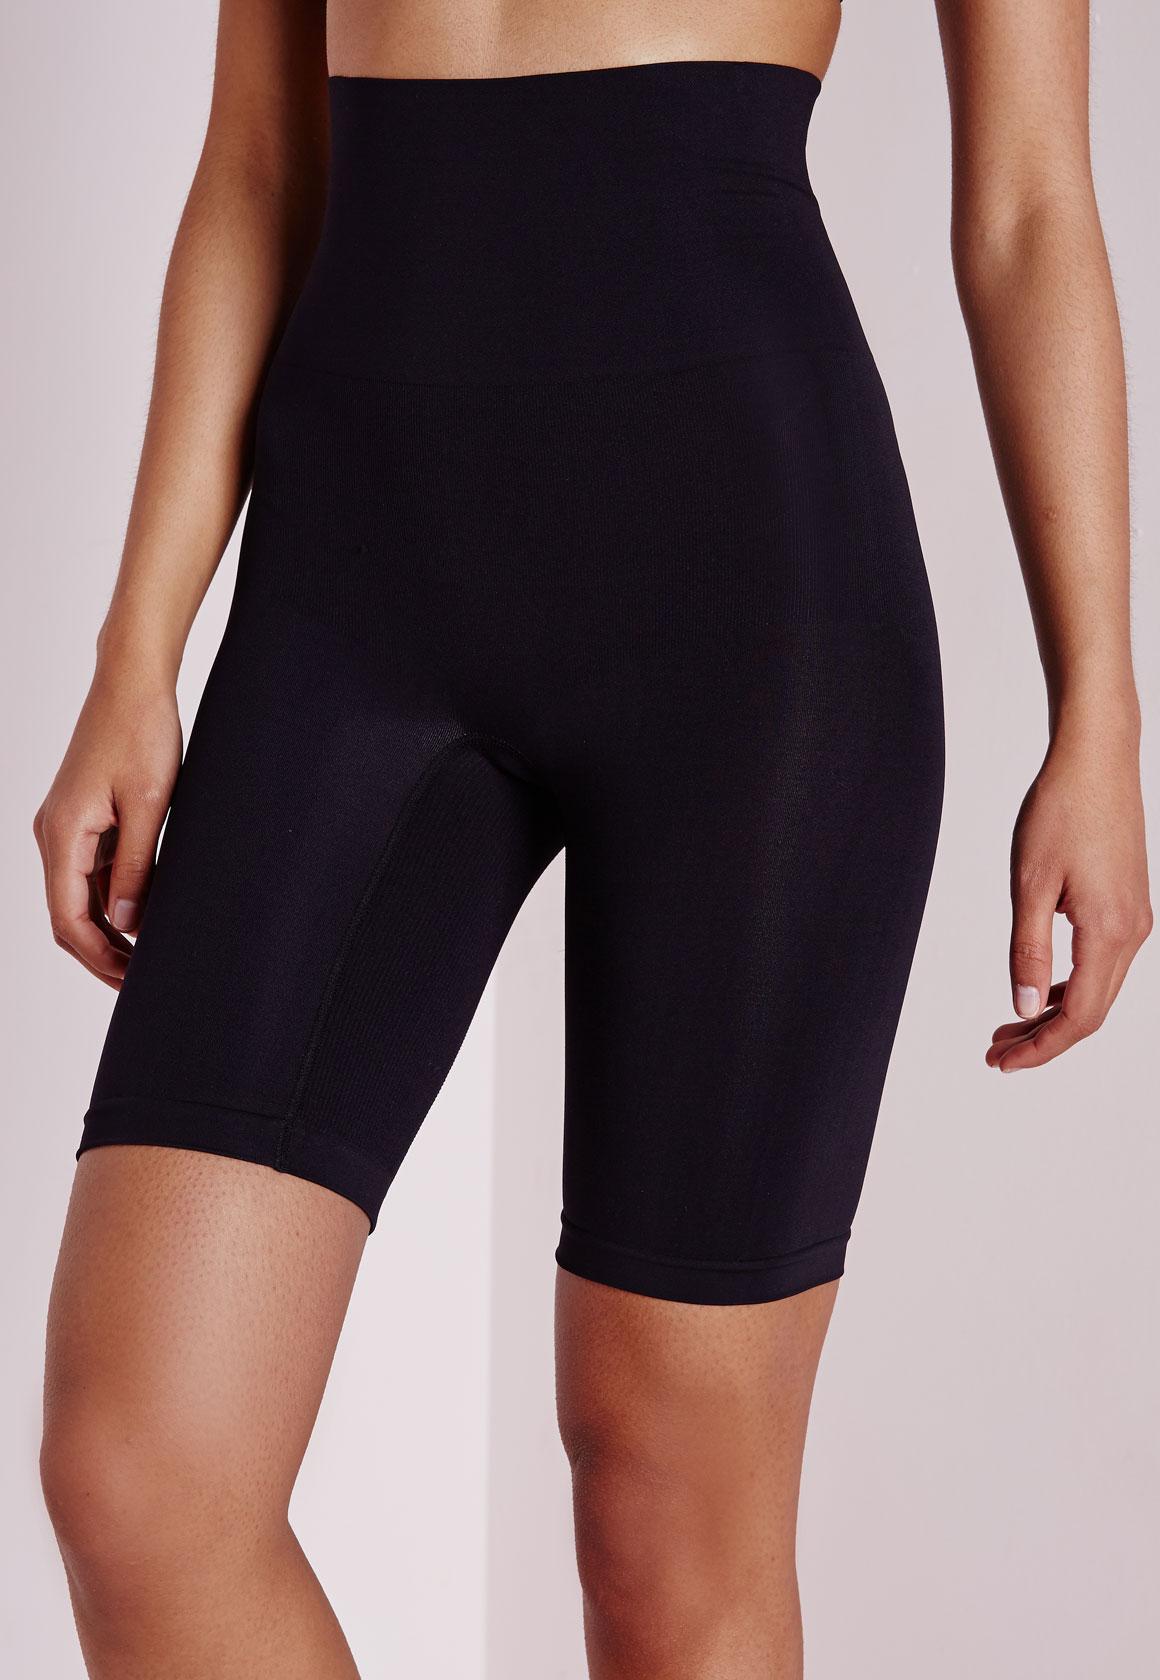 Fashion Shop - Black Shapewear Shorts